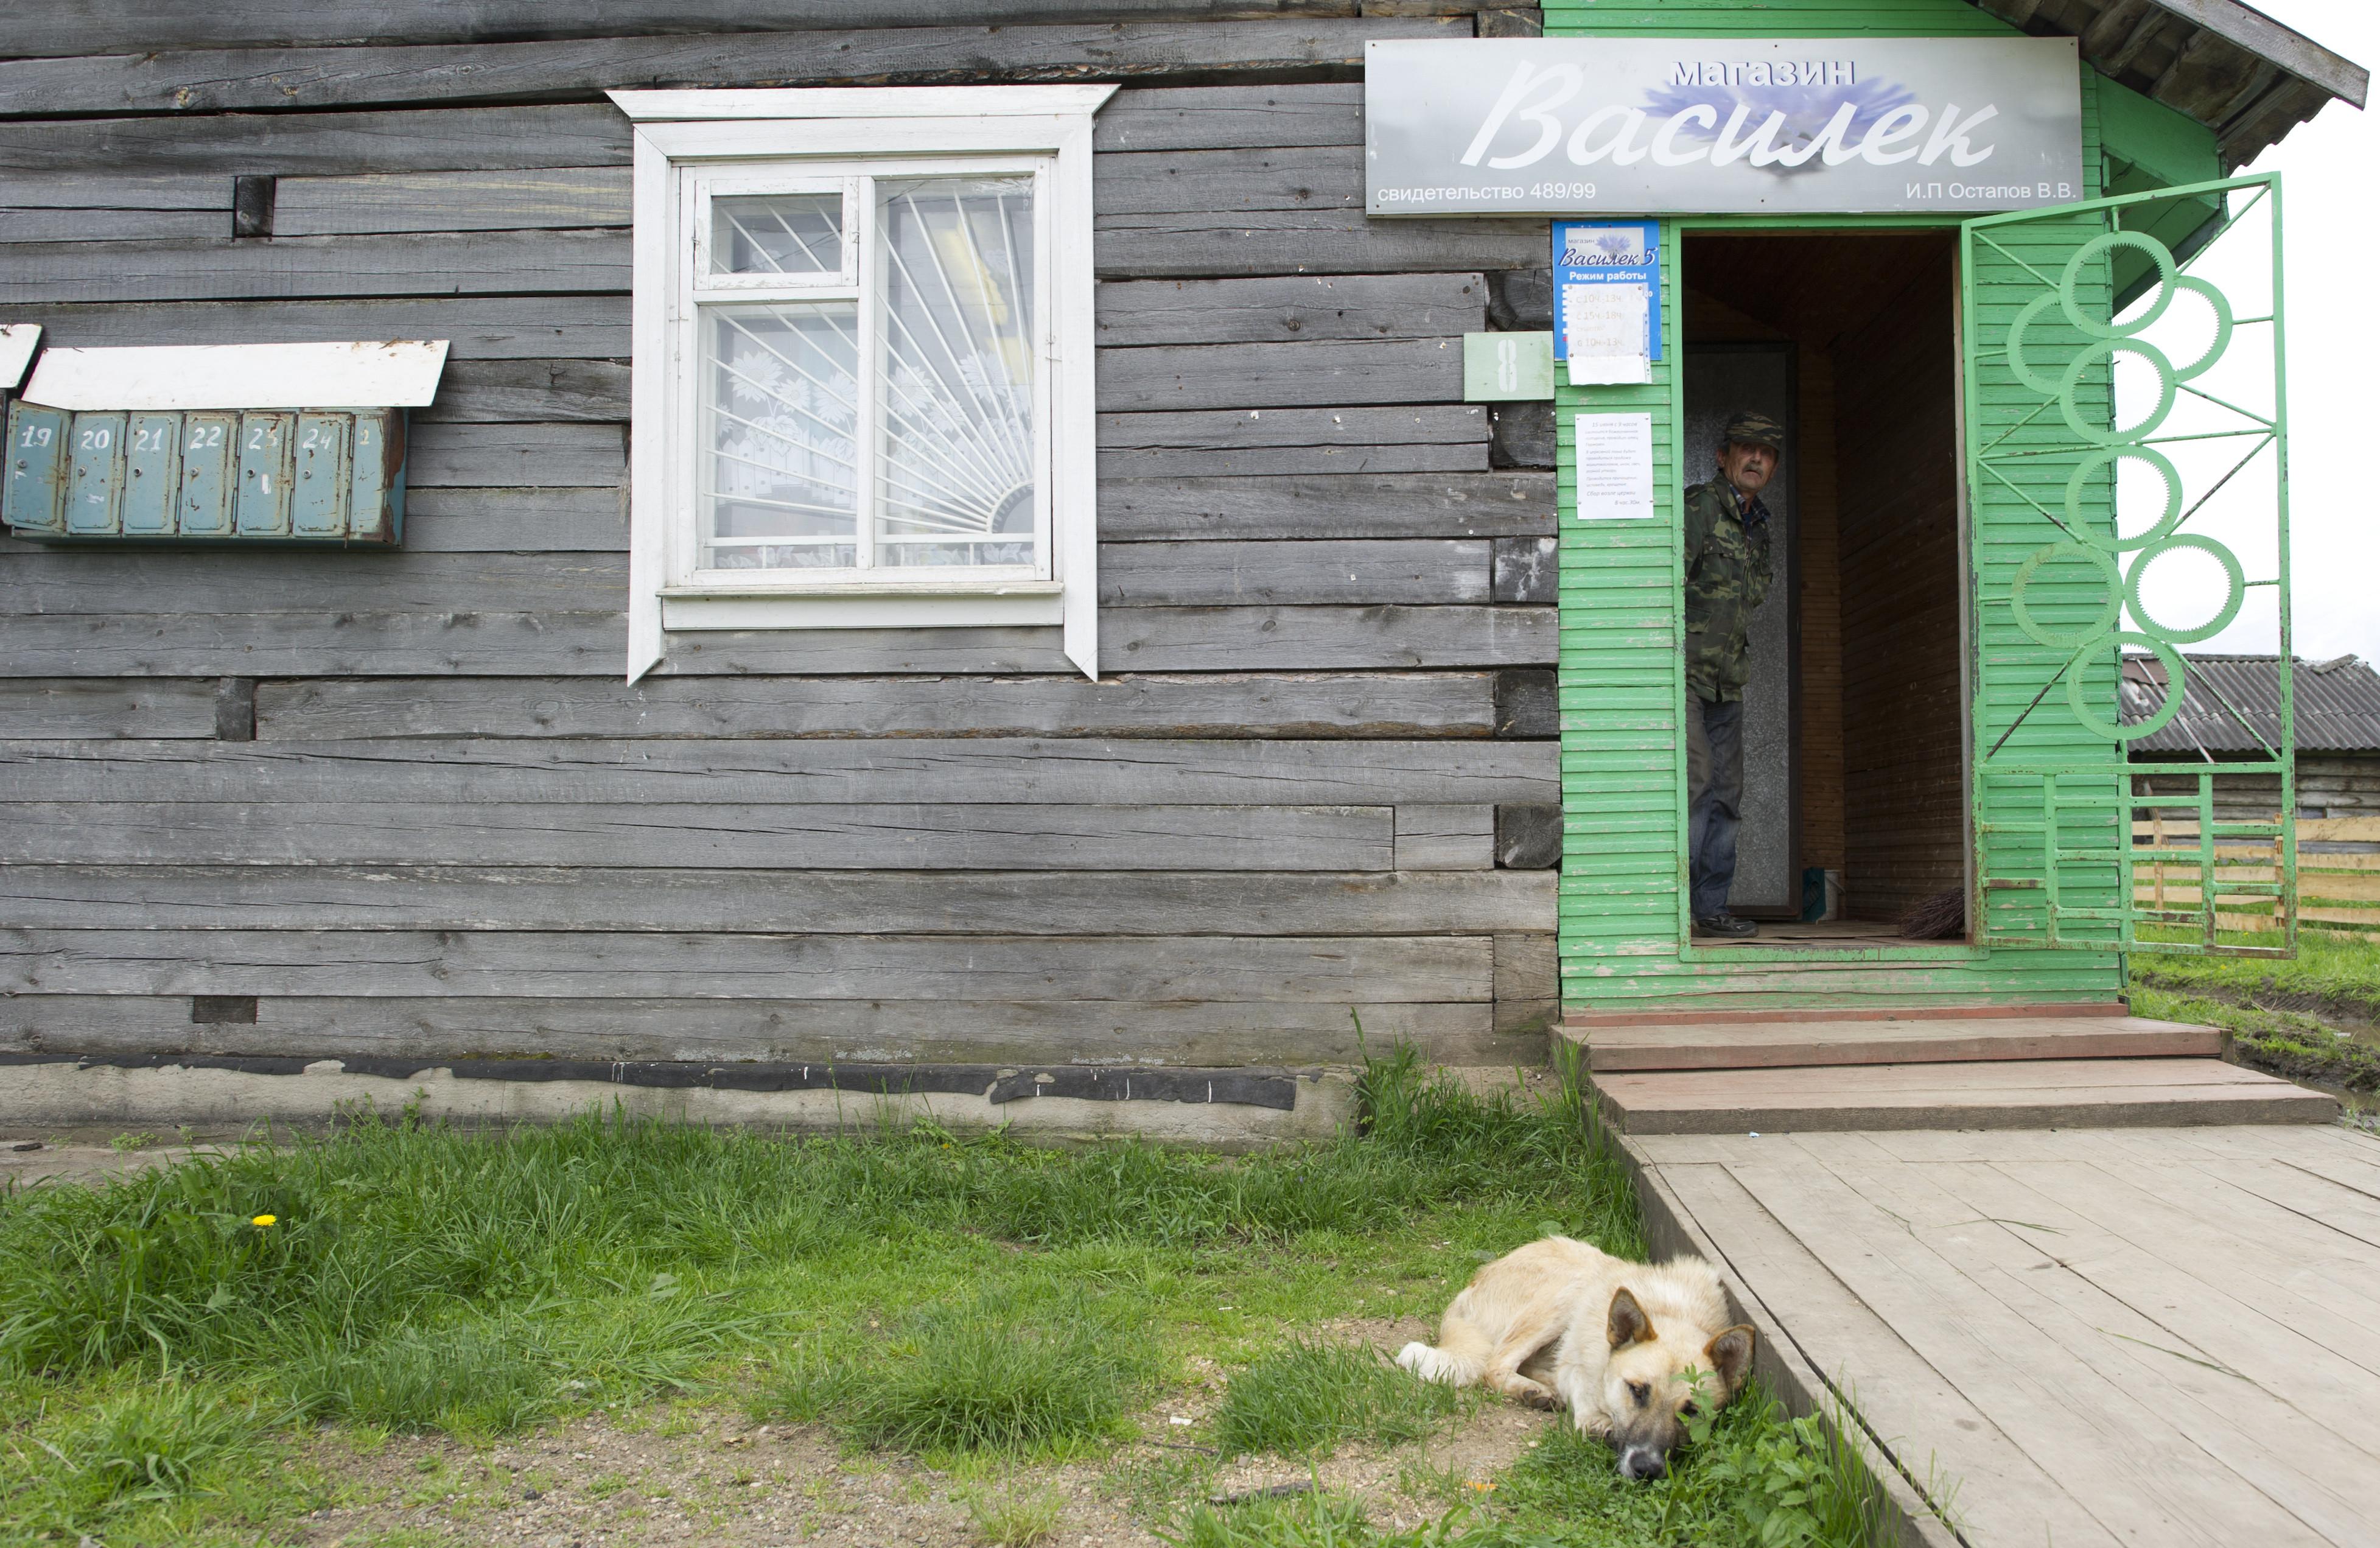 <p><span>Фото: &copy; РИА Новости/</span><span>&nbsp;</span>Илья Питалев</p>